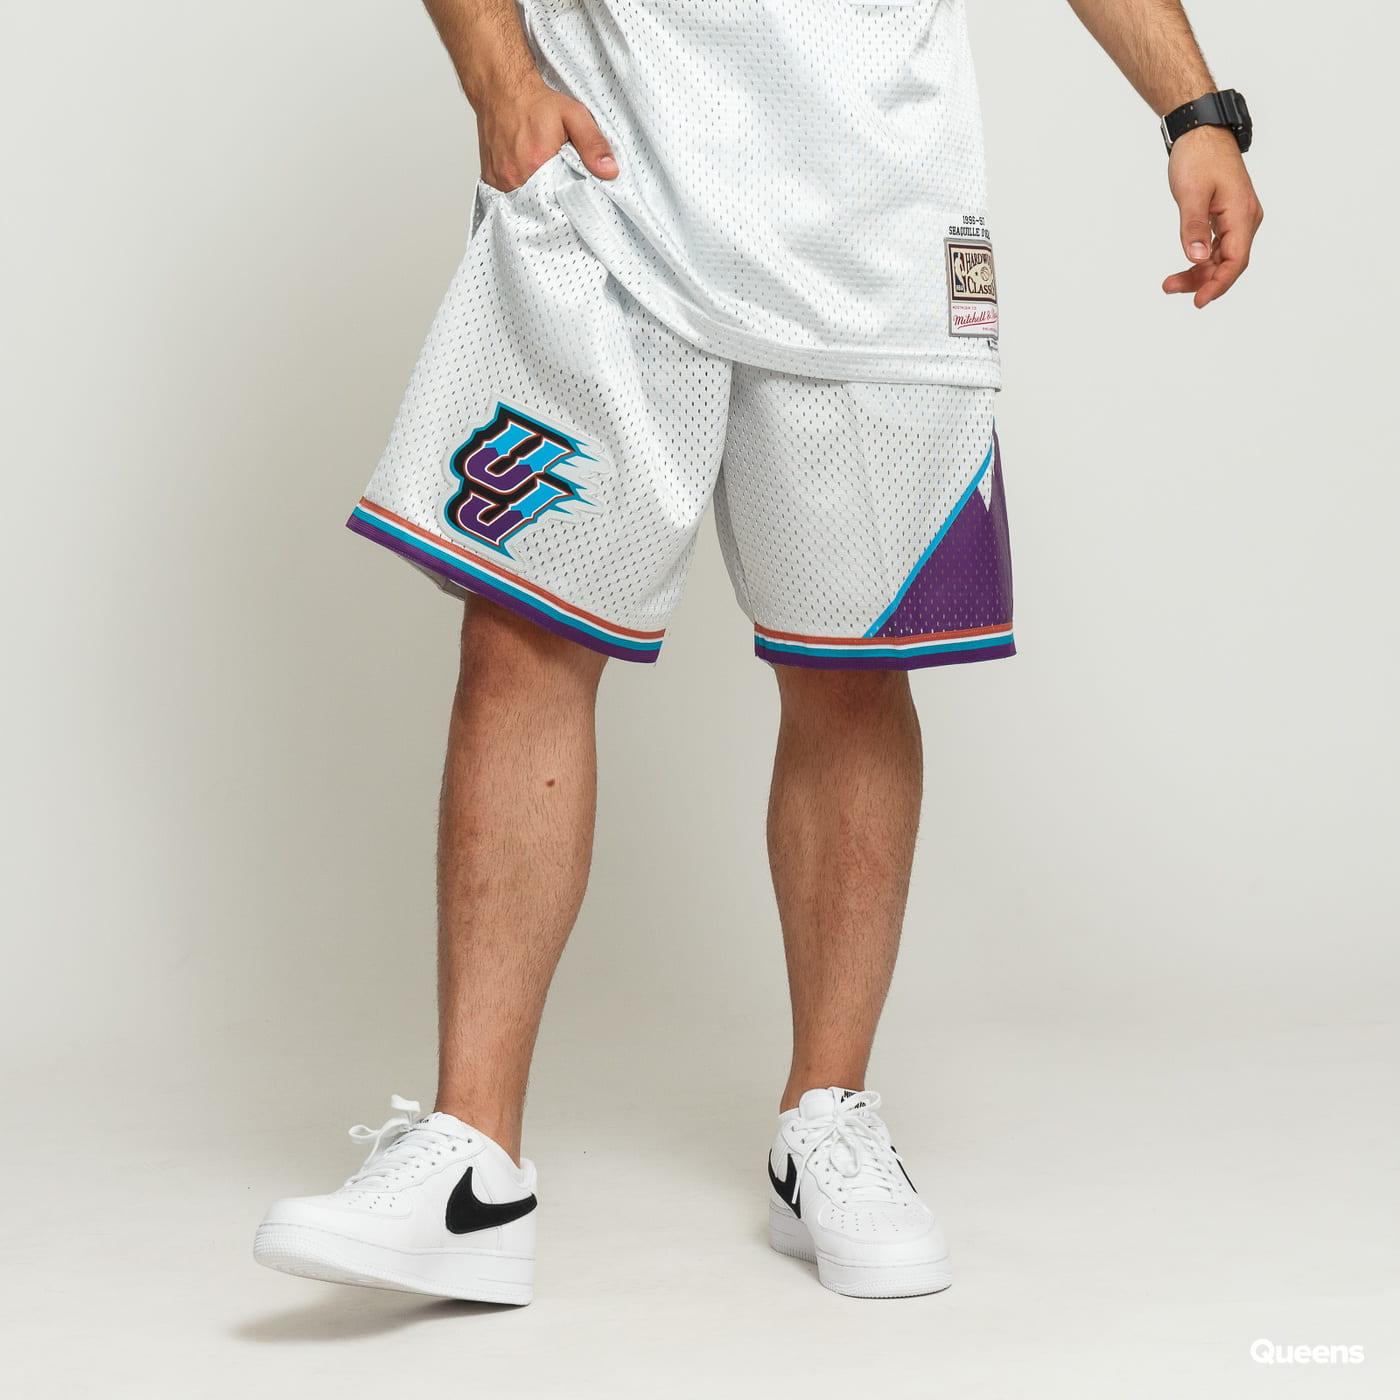 online store 0717b 8f918 Mitchell & Ness NBA Swingman Shorts Utah Jazz silver